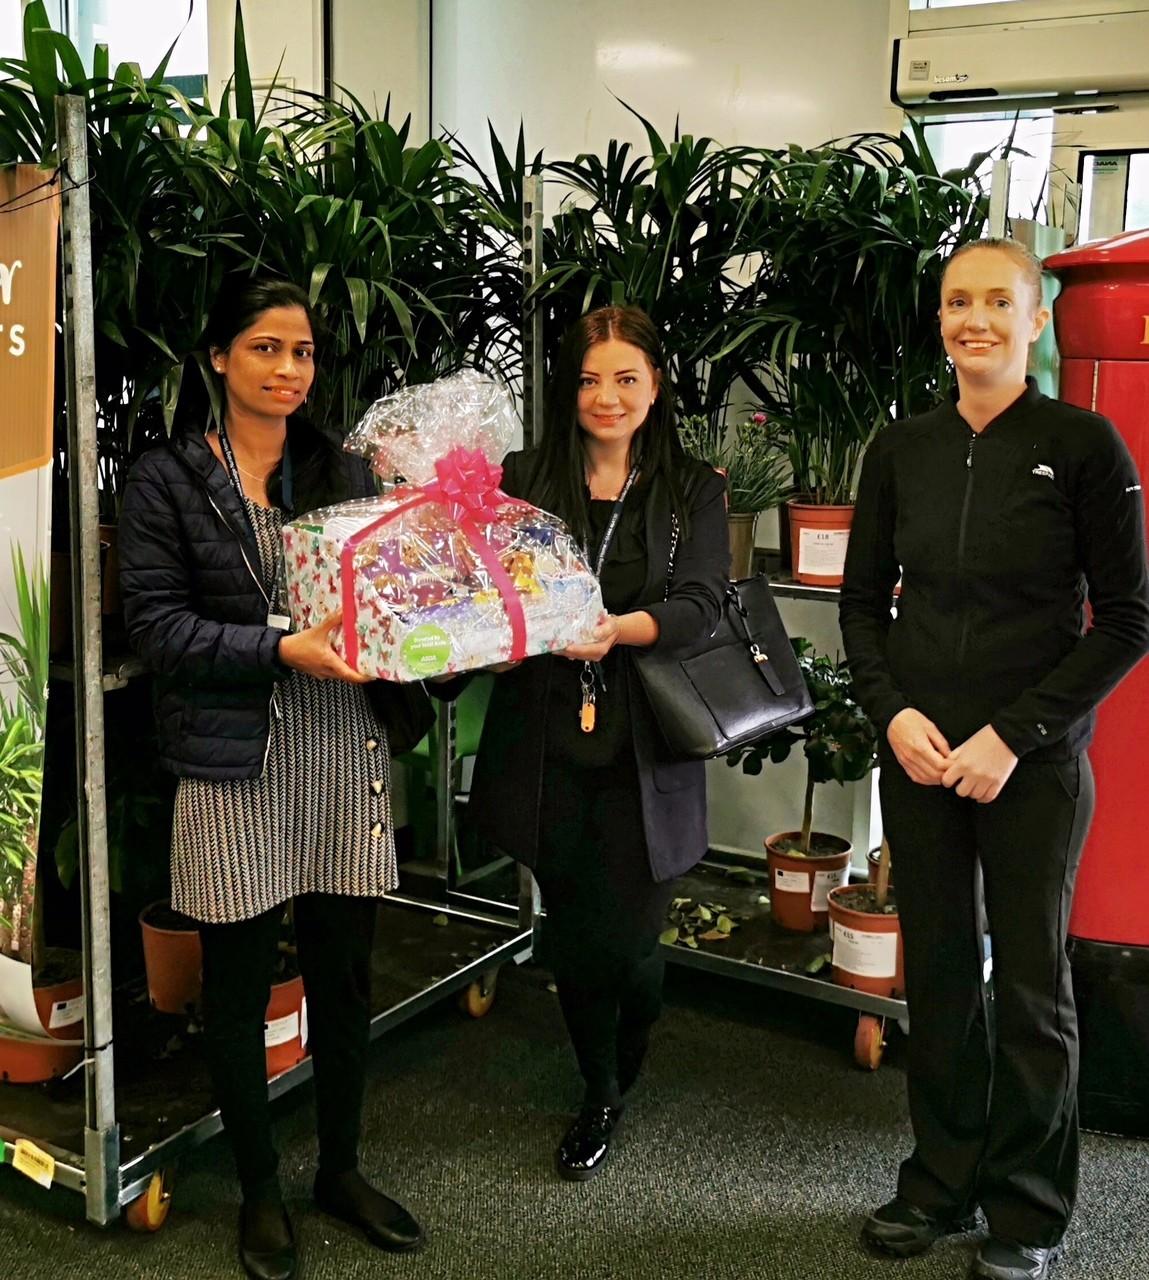 Care home donation | Asda Crawley